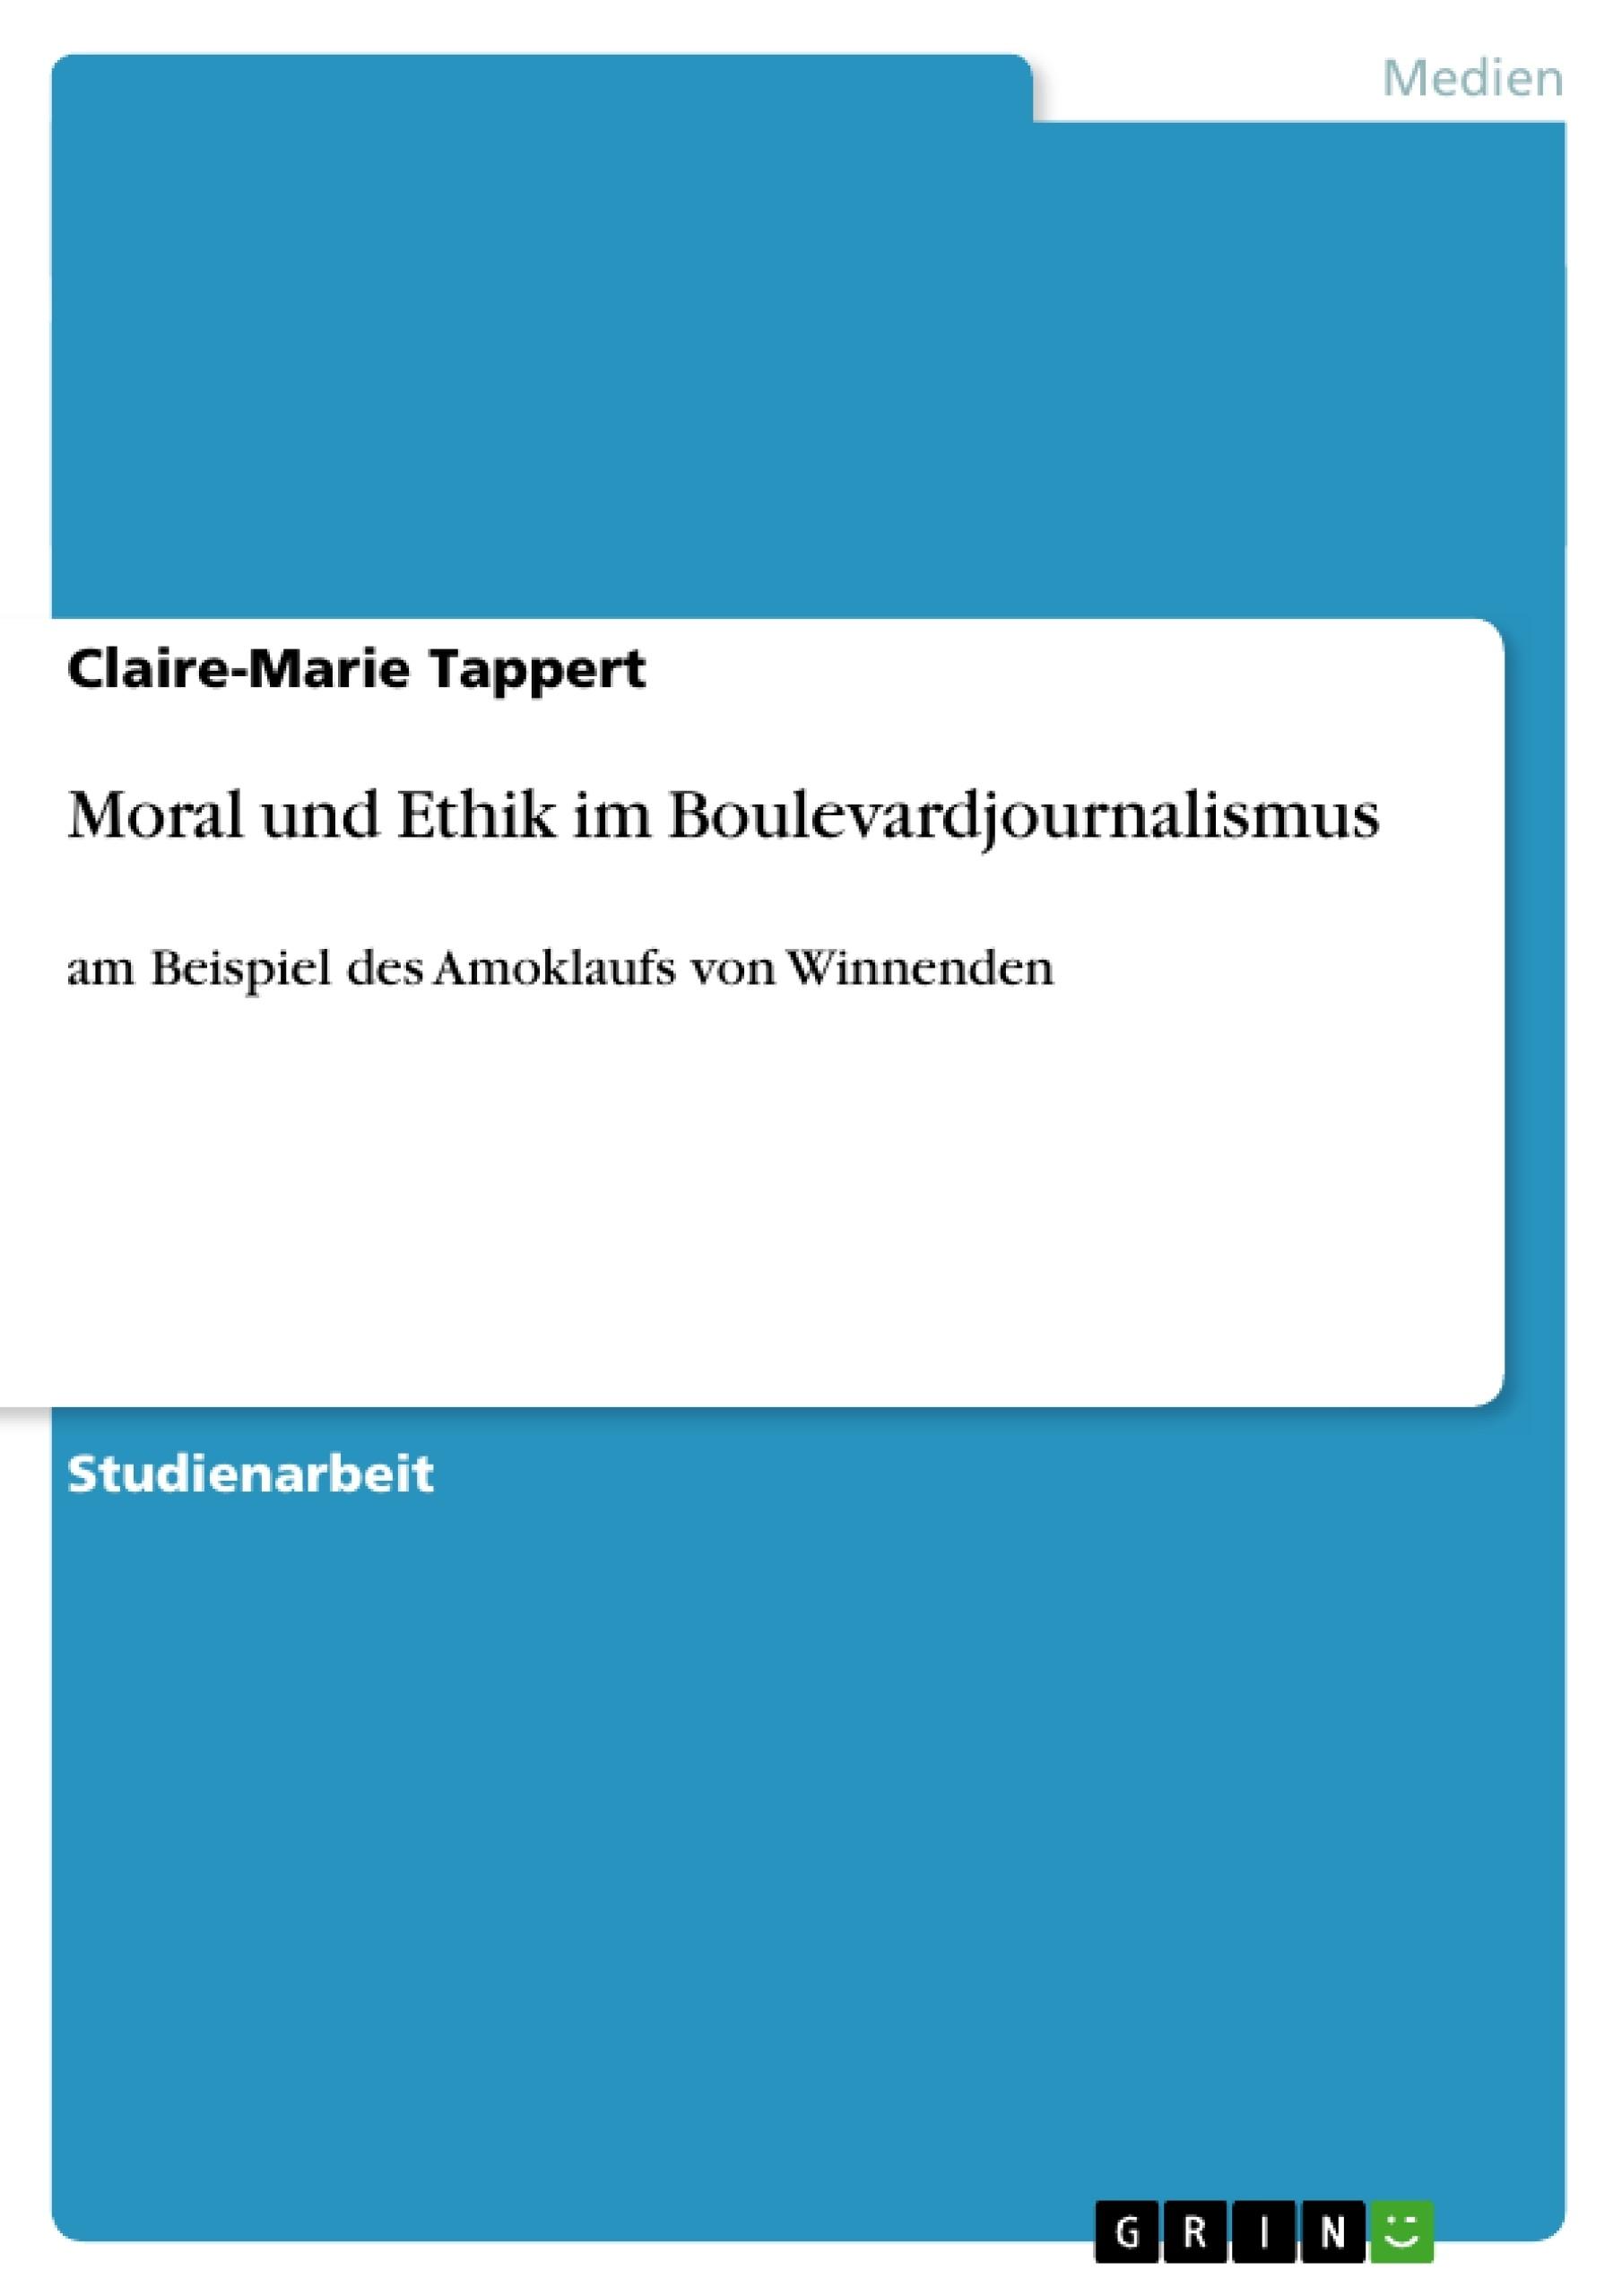 Titel: Moral und Ethik im Boulevardjournalismus